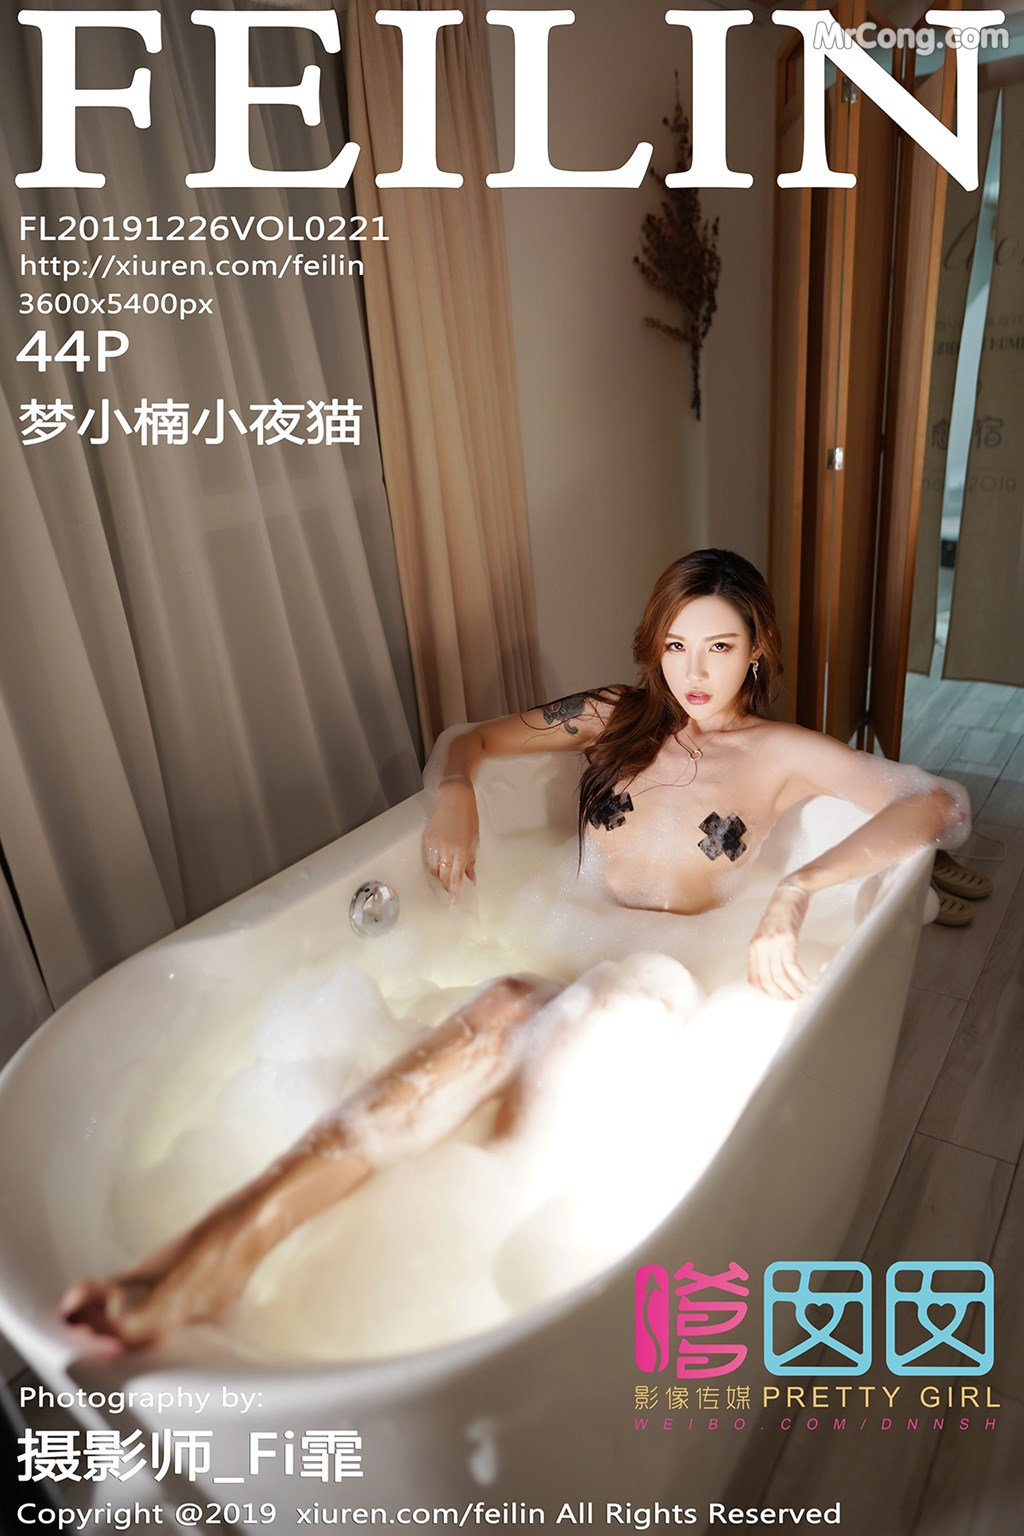 FEILIN Vol. 2121: 梦 小楠 小 夜 猫 (45 pictures)